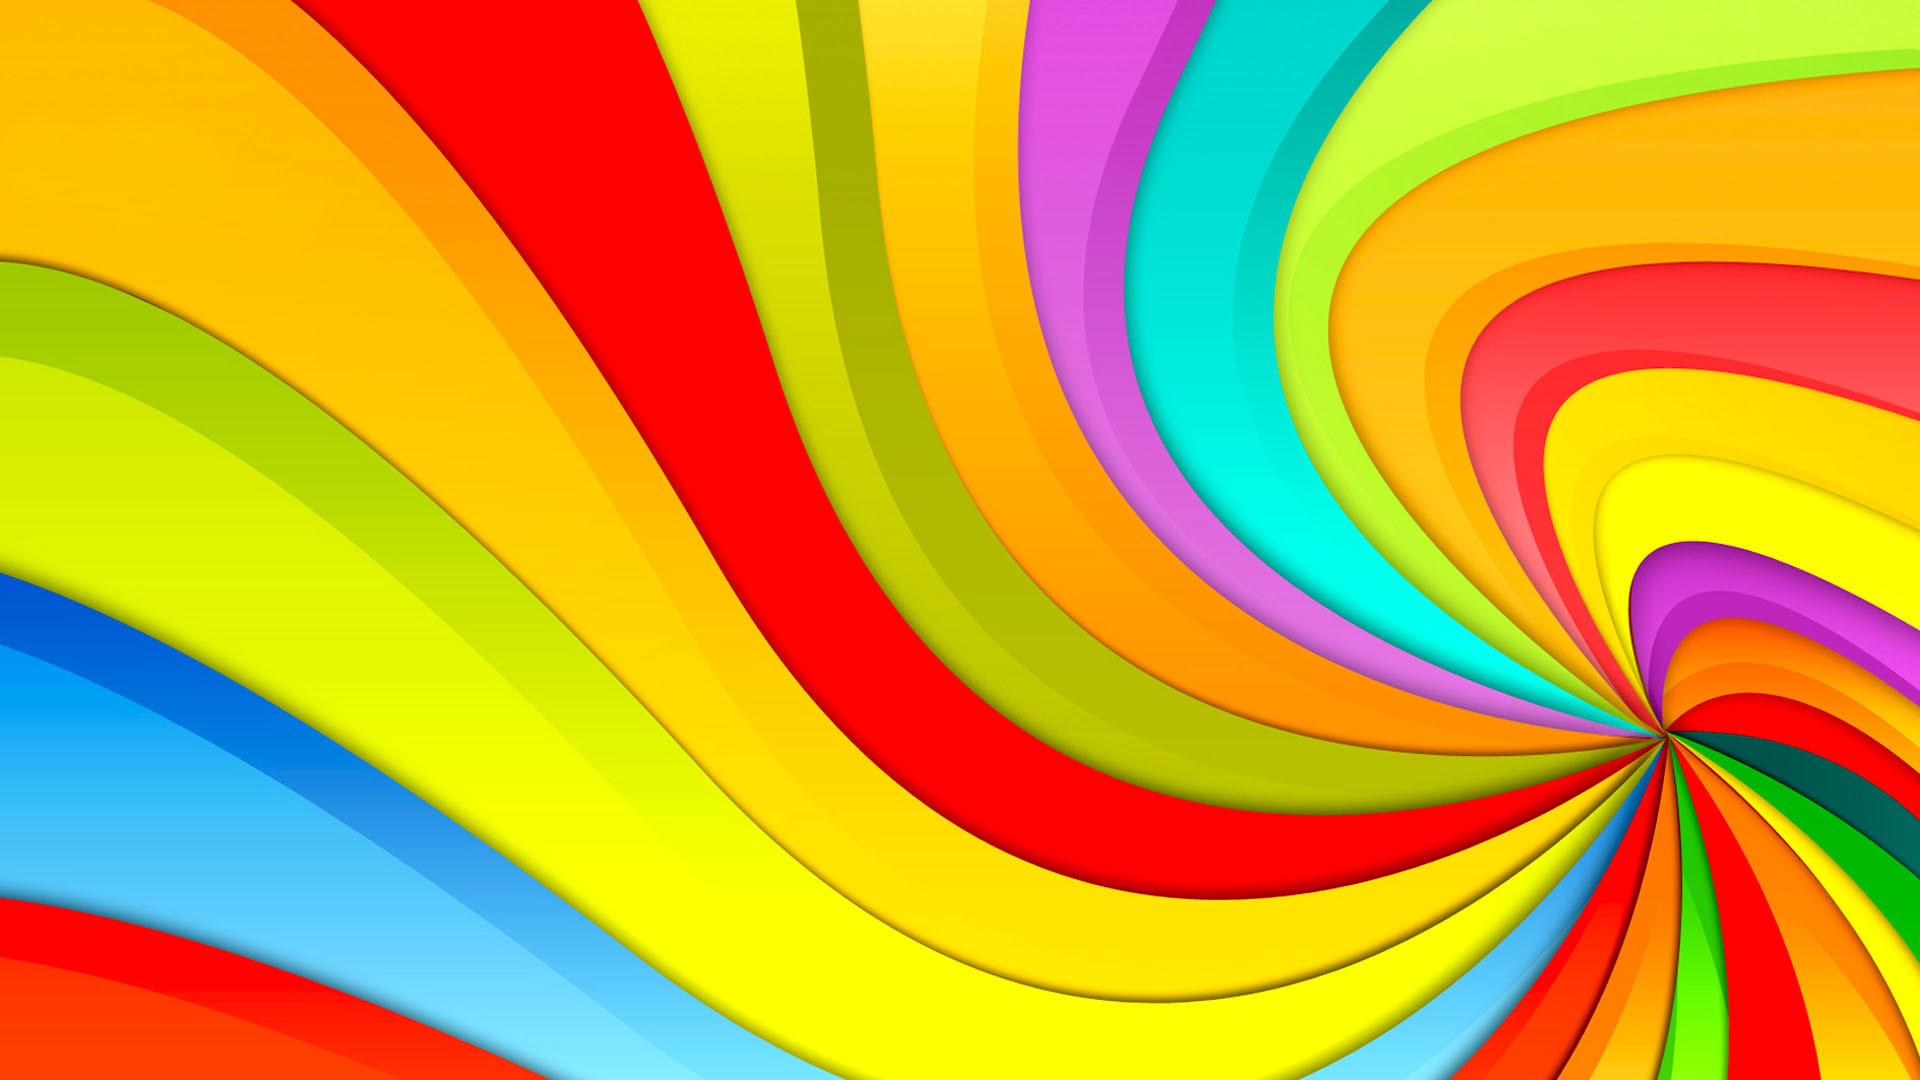 Colorful Desktop Backgrounds | Colorful For Desktop – HD Wallpapers